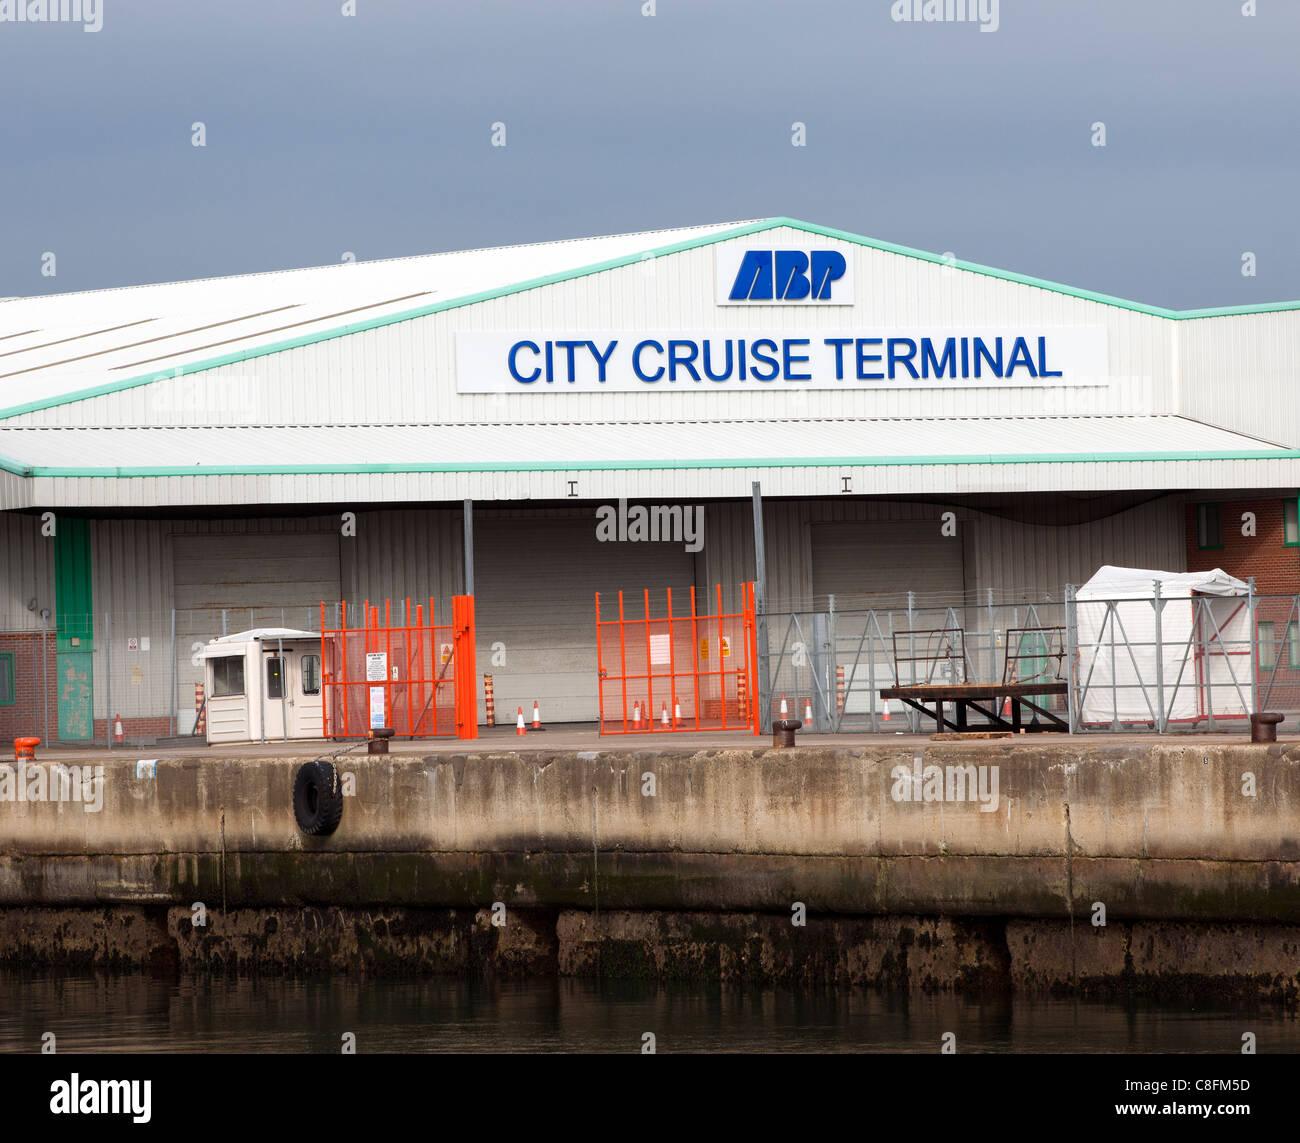 ABP City Cruise Terminal Berth 101 New Docks, Port of Southampton, Southampton, Hampshire, England, UK. - Stock Image